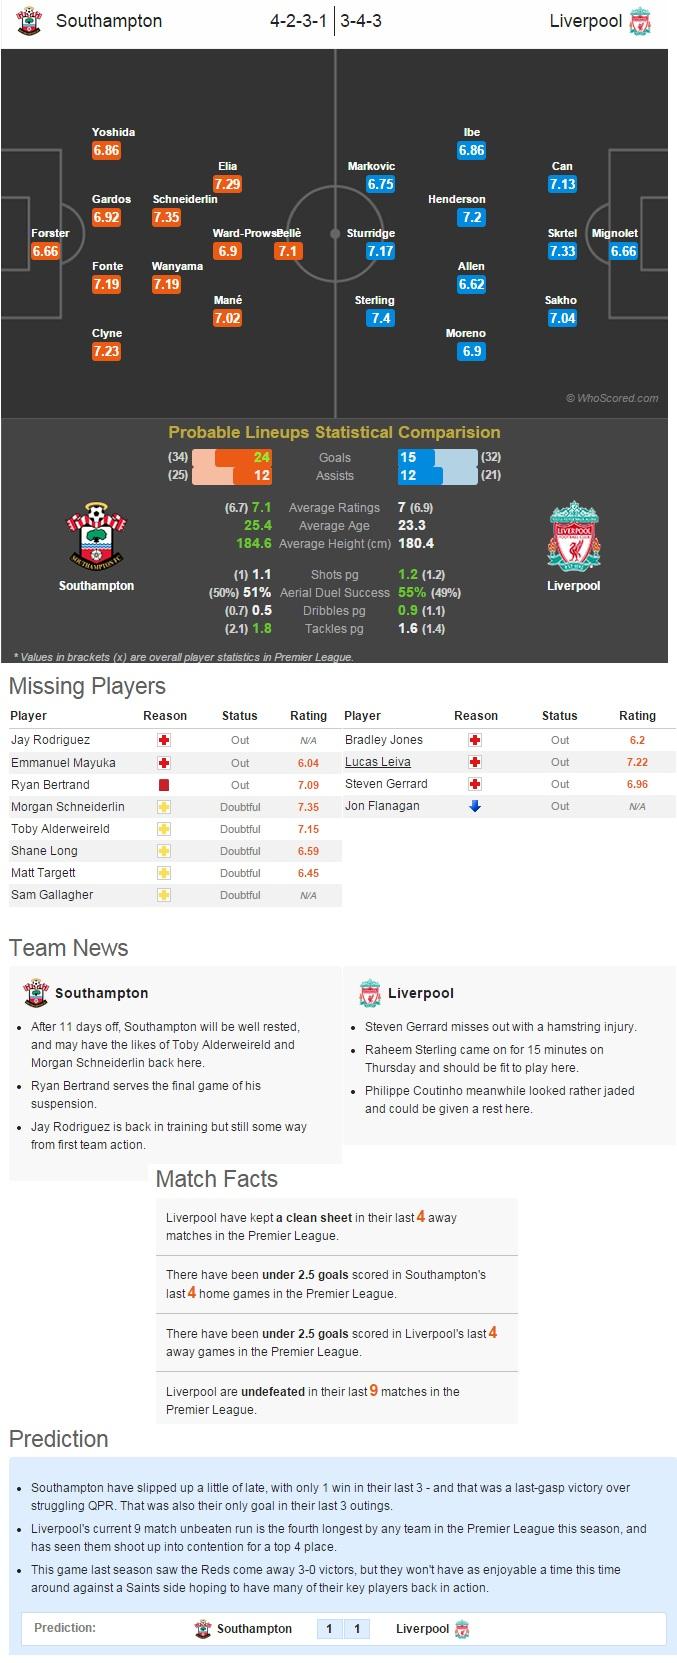 Southampton vs Liverpool - Statistical Preview